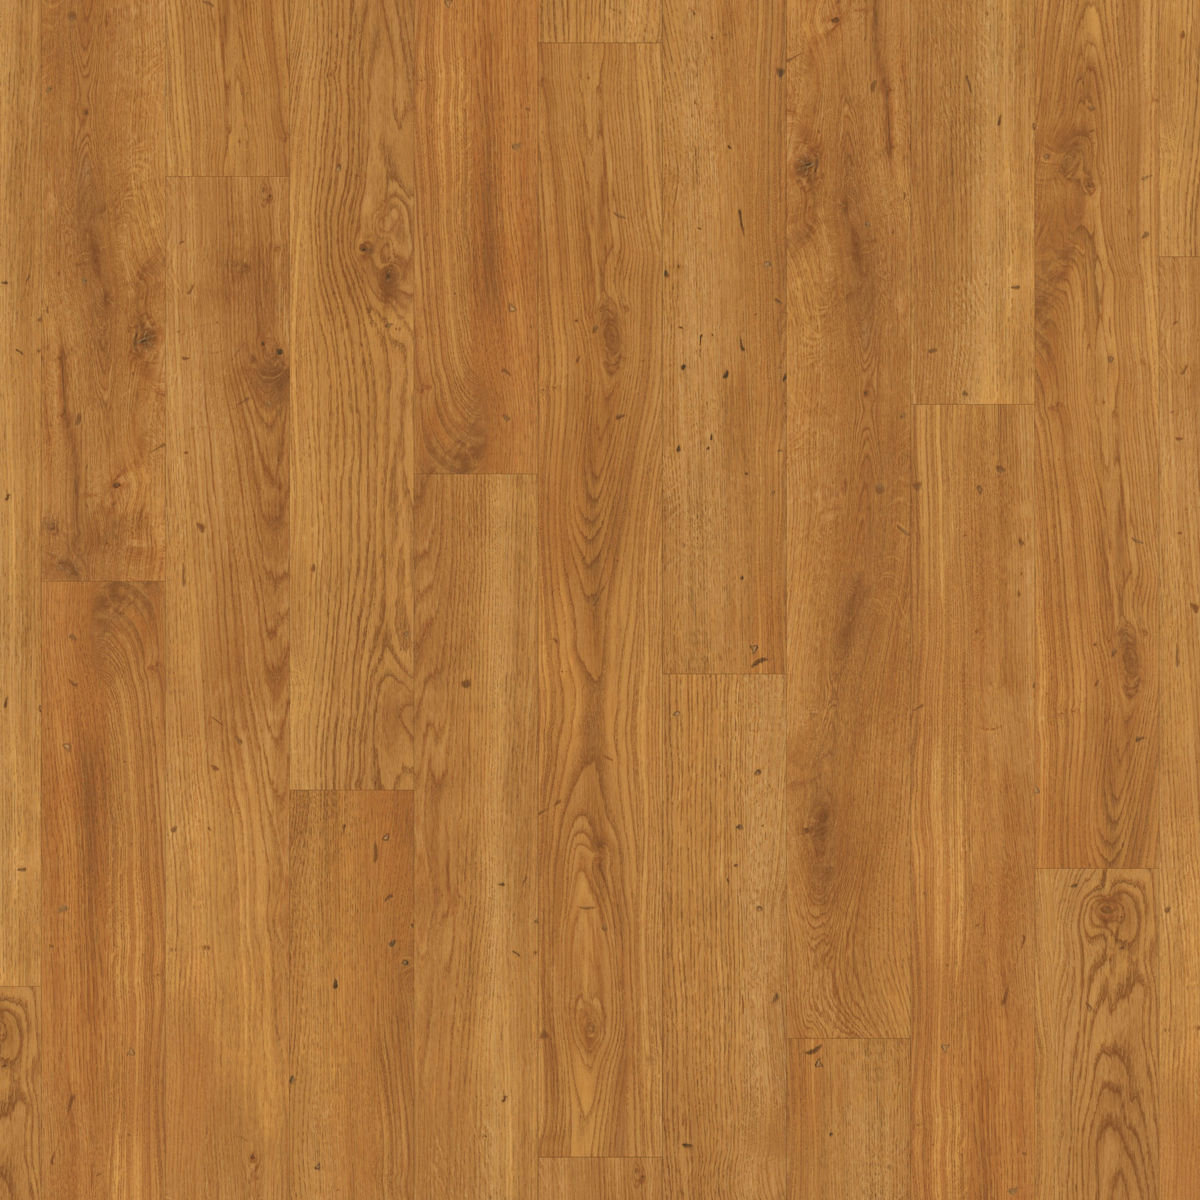 karndean knight tile victorian oak kp91 vinyl flooring. Black Bedroom Furniture Sets. Home Design Ideas